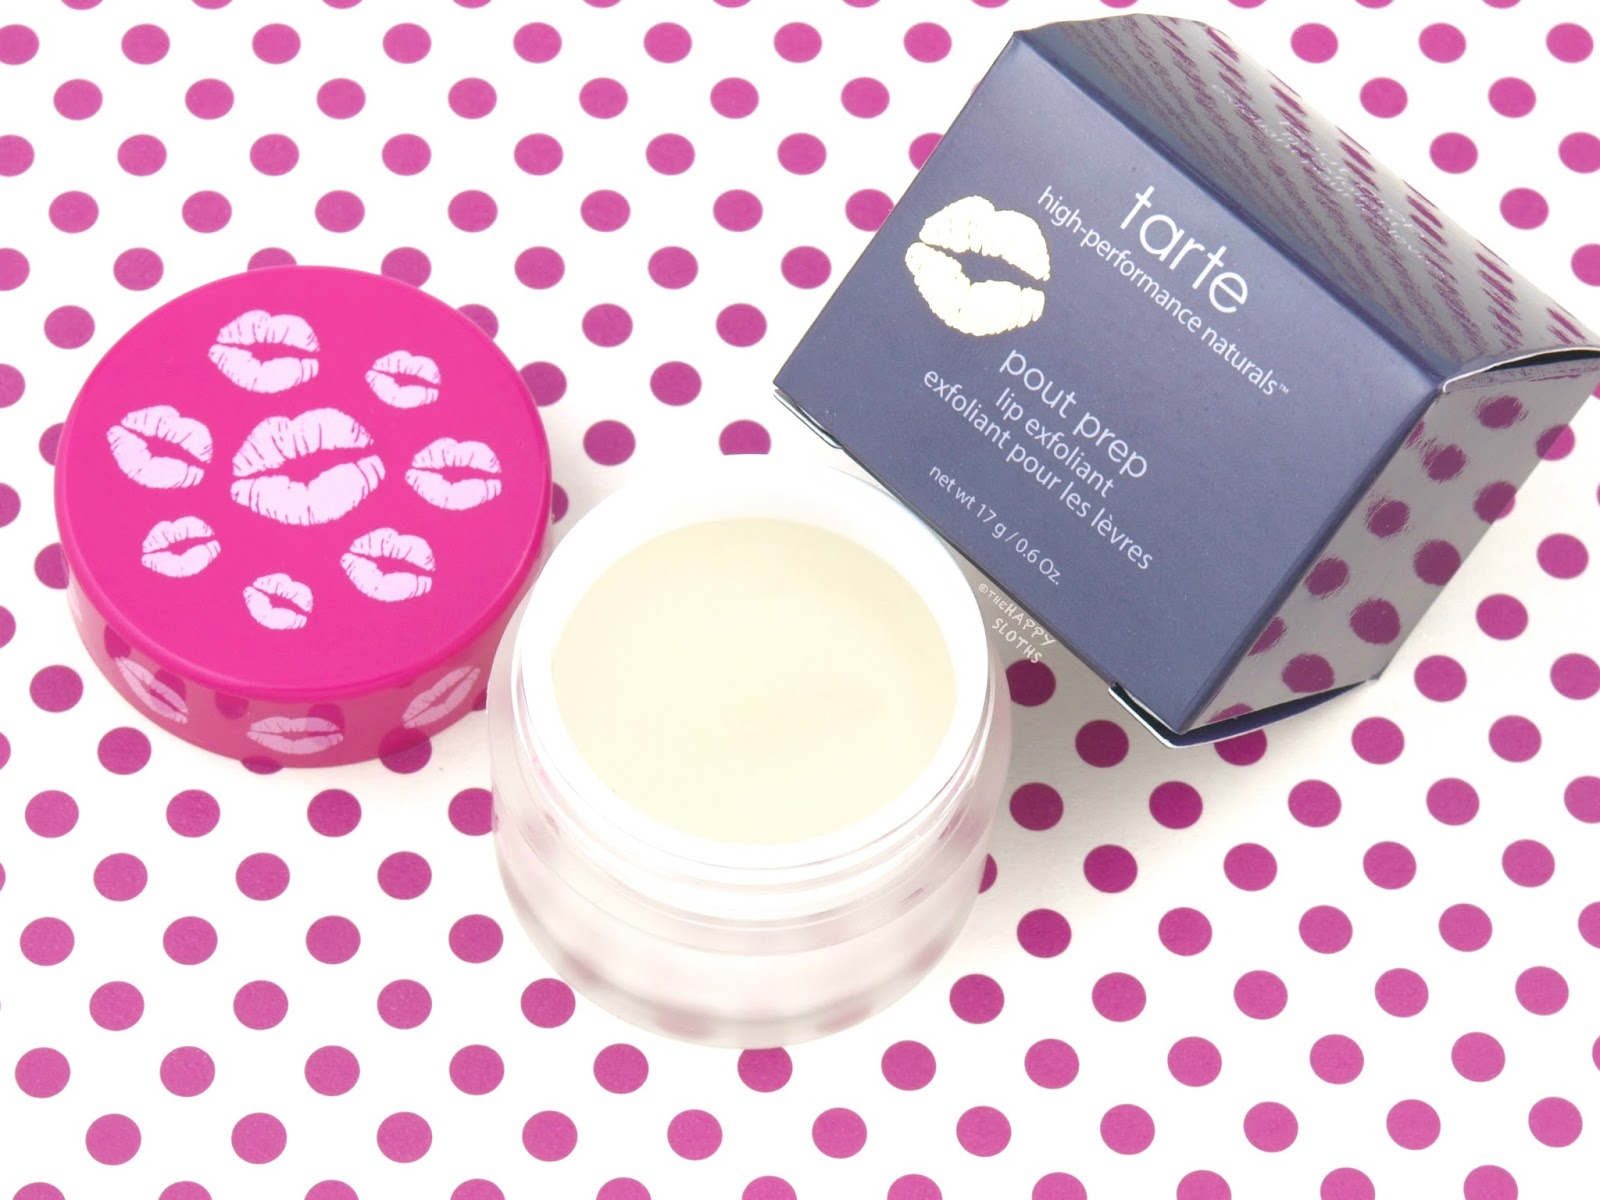 Tarte Pout Prep Lip Exfoliant: Review